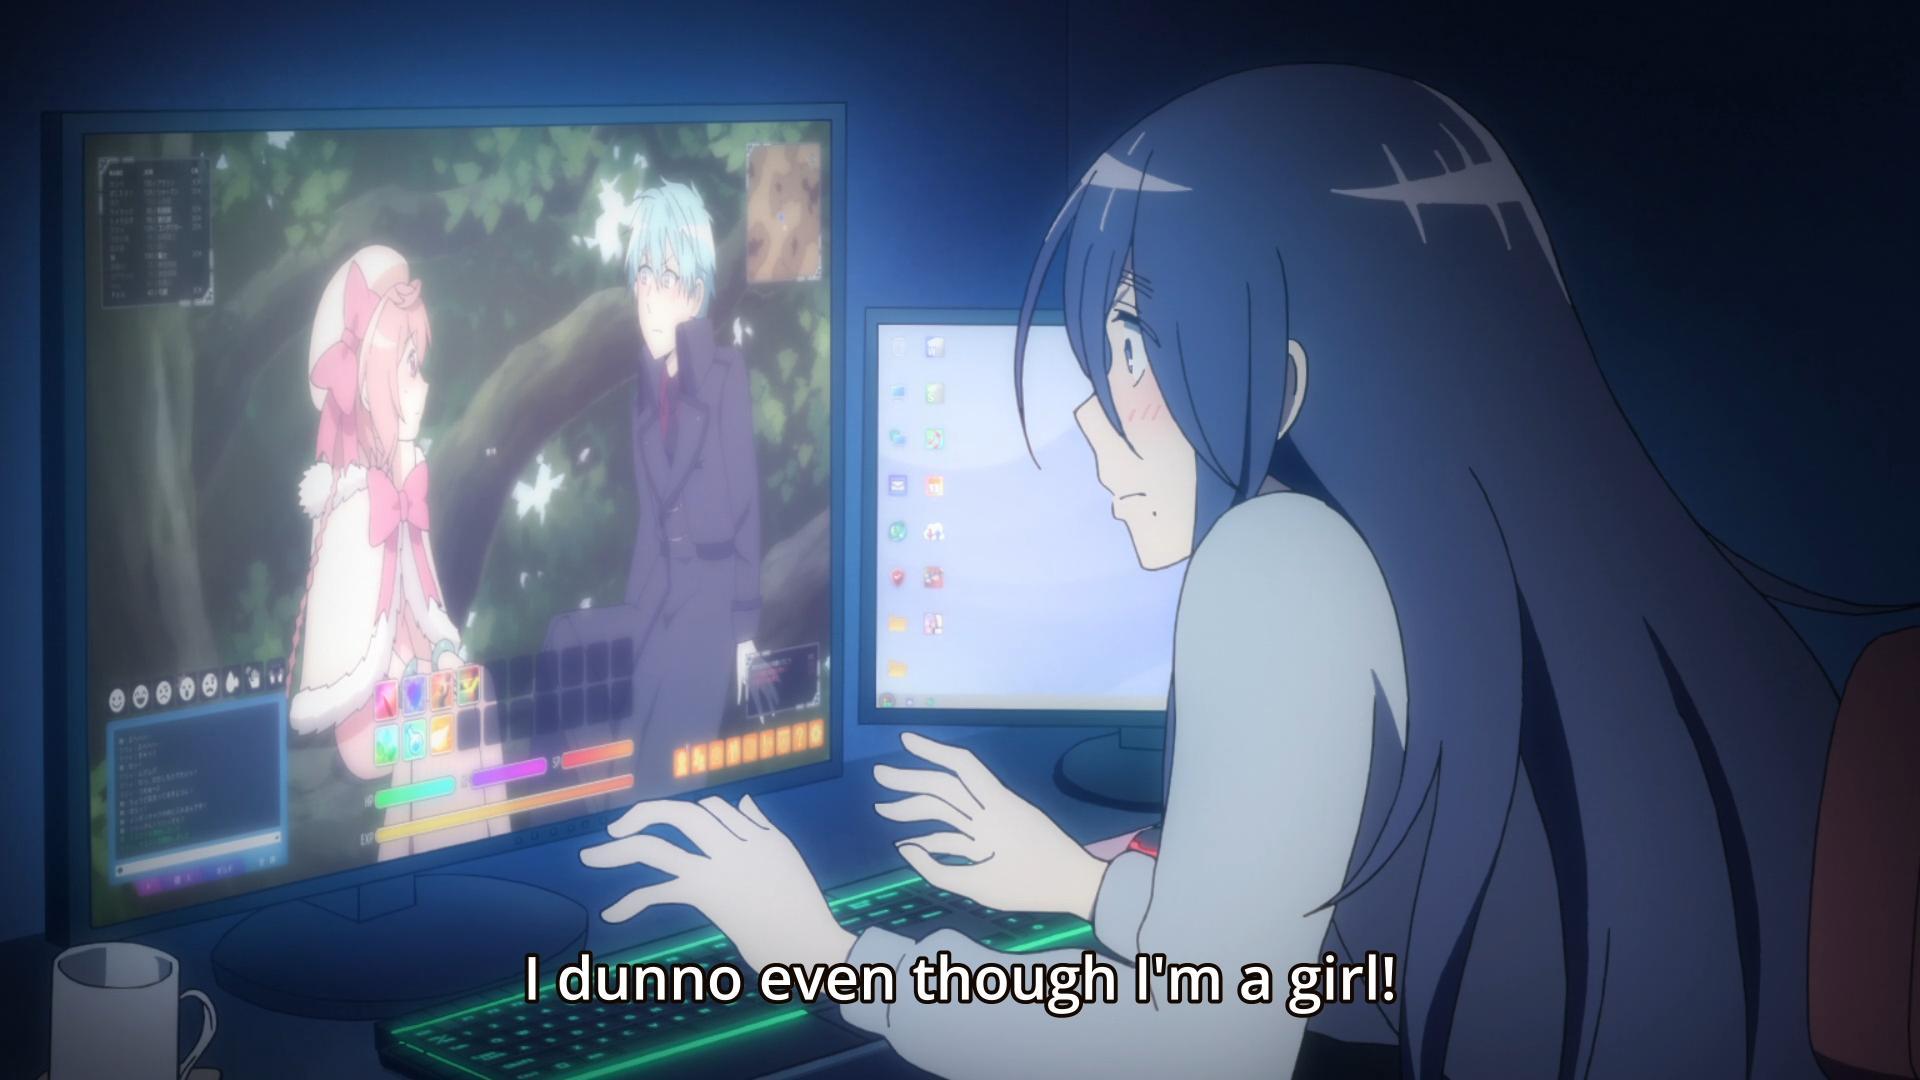 Ashley Fujoshi Princess On Twitter The Anime Isn T Gay Stop